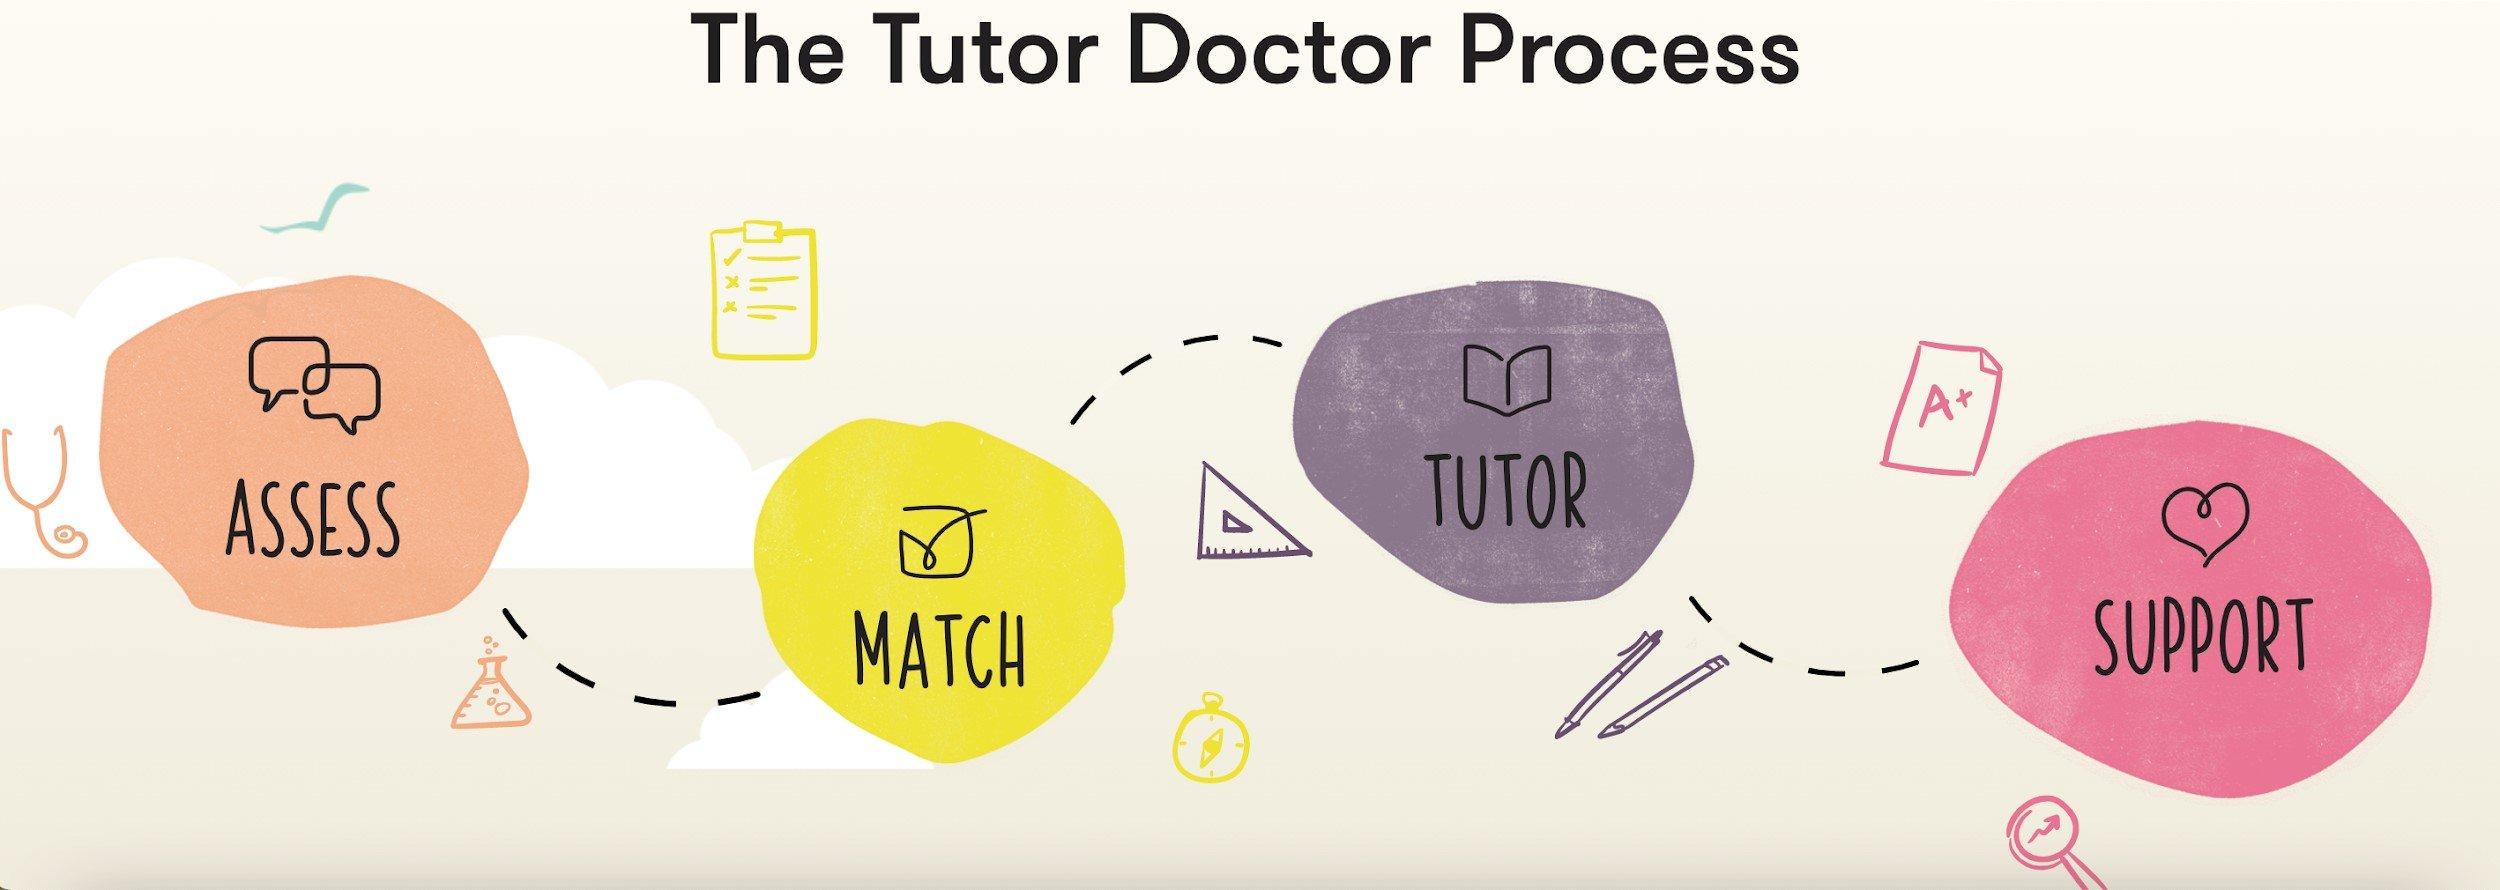 Our Process: Assess, Match, Tutor, Support